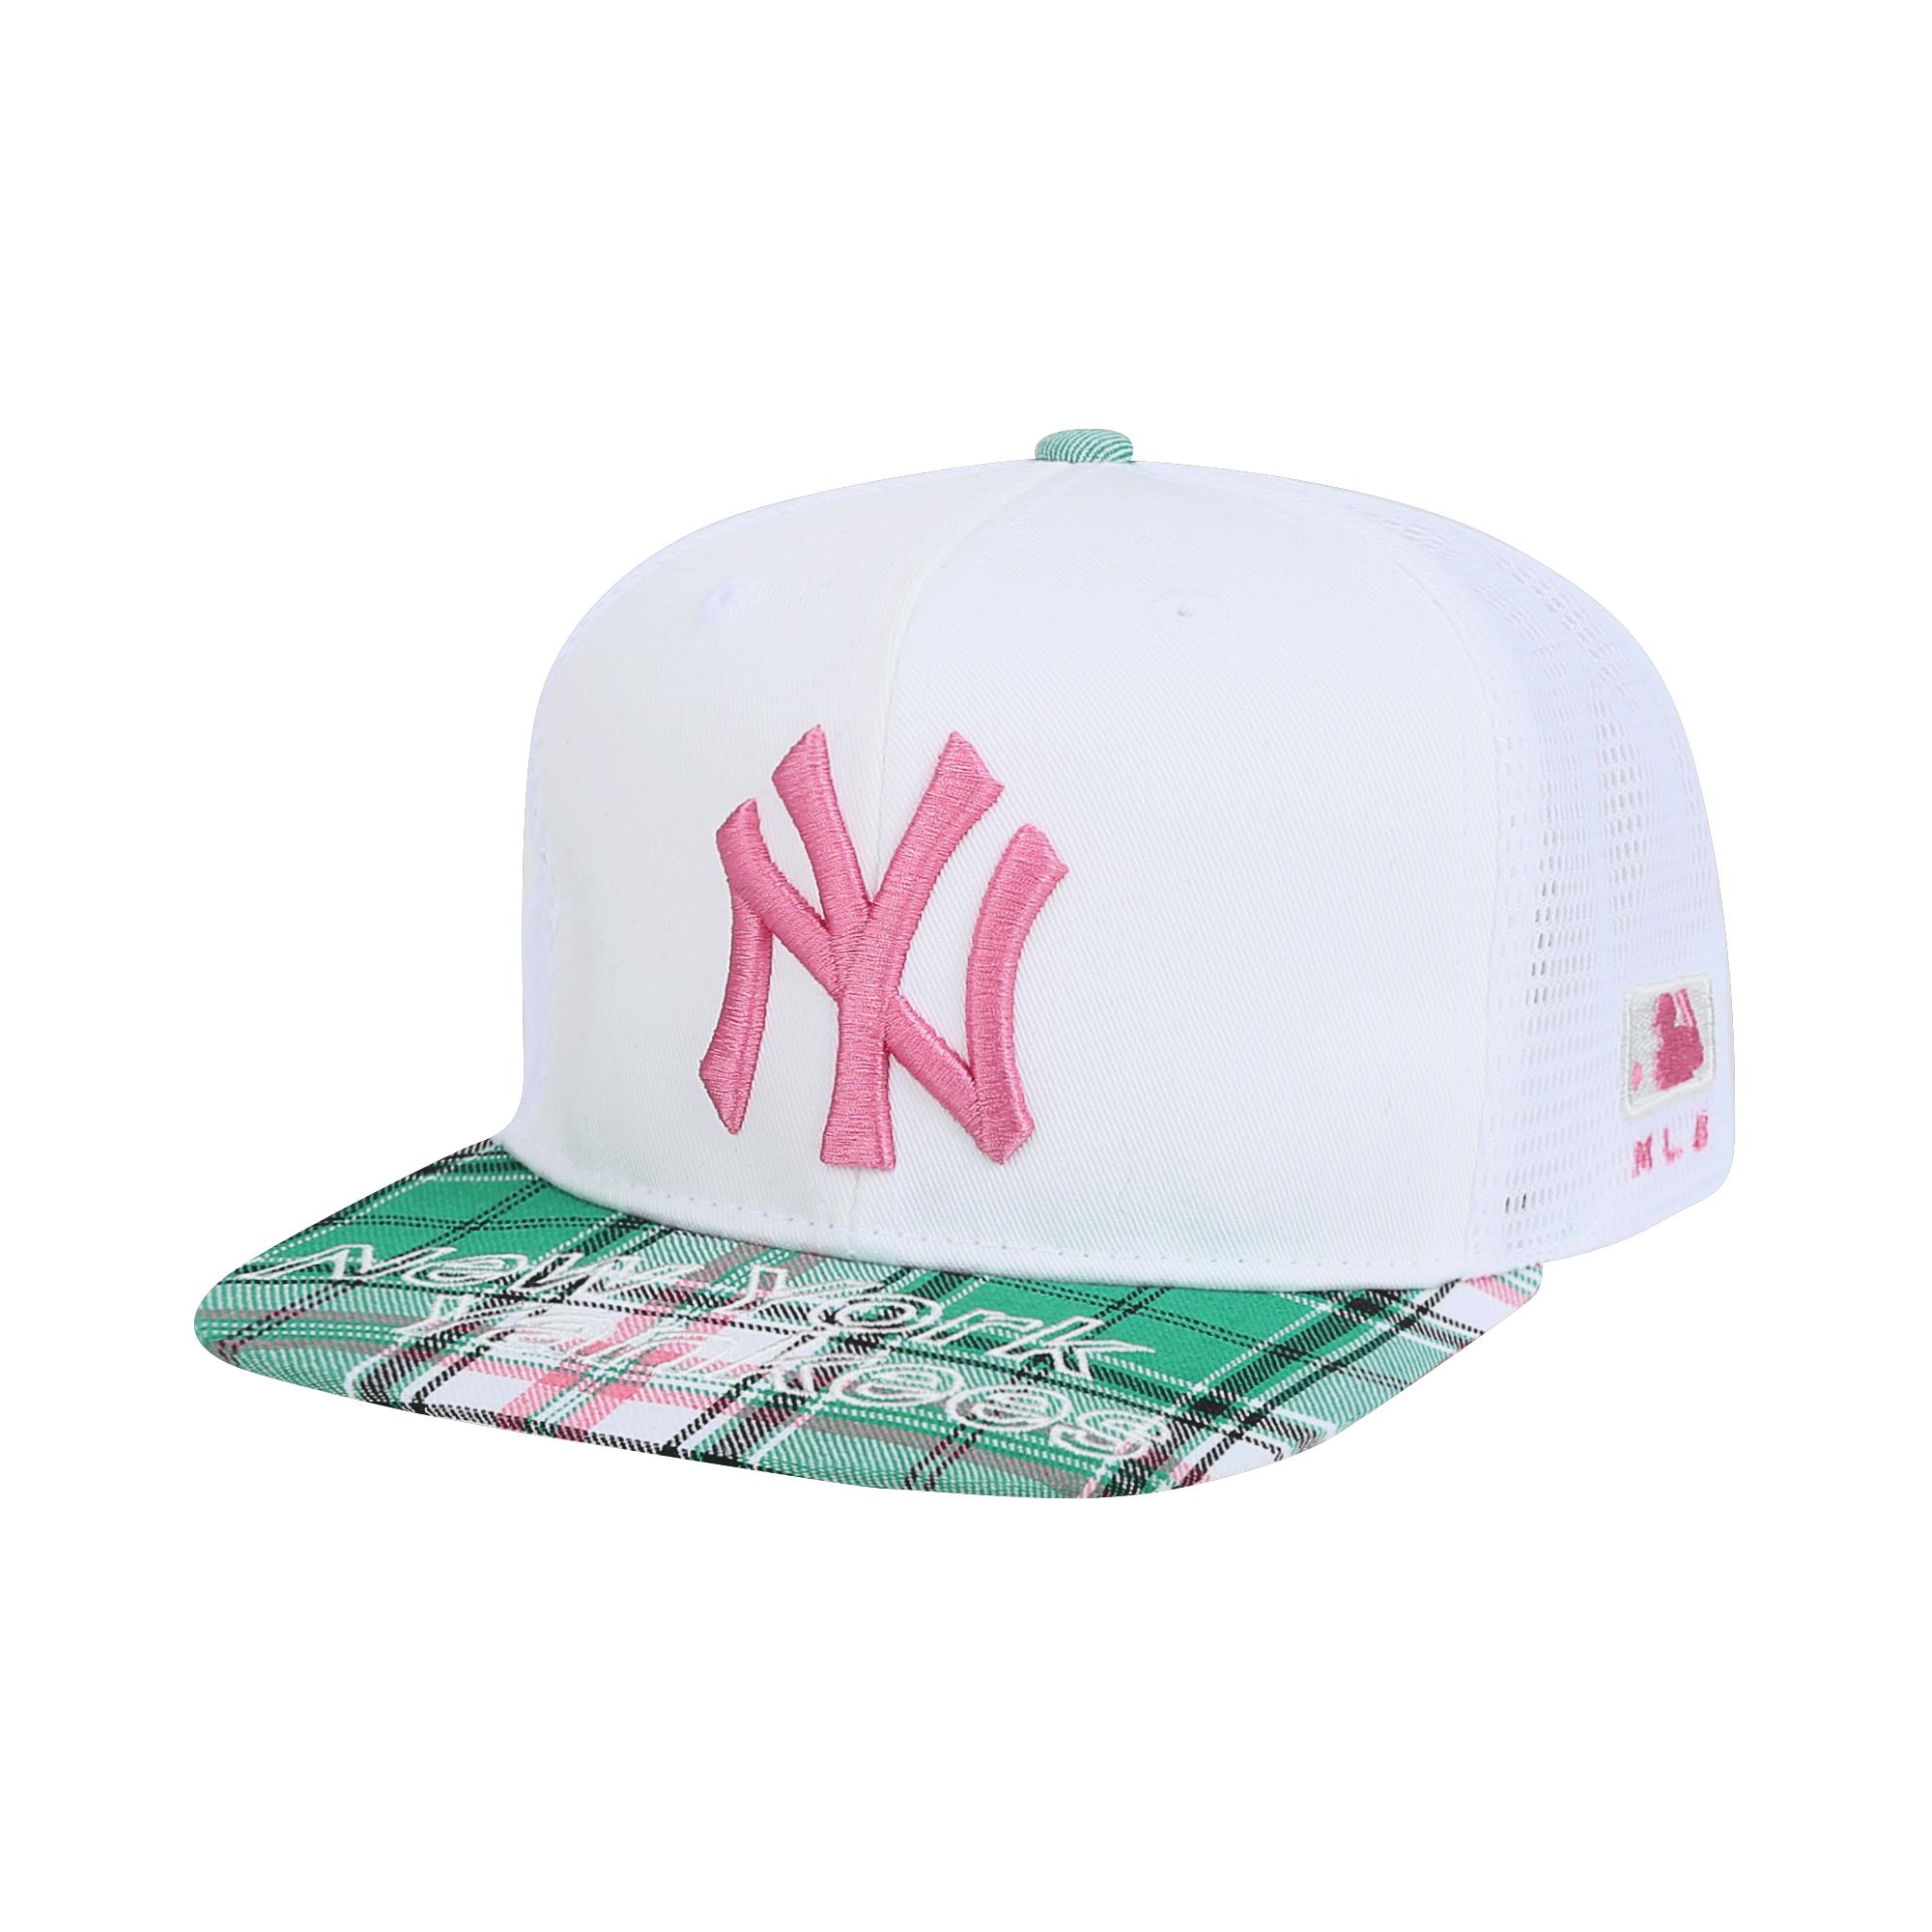 NEW YORK YANKEES CHECK MESH SNAPBACK